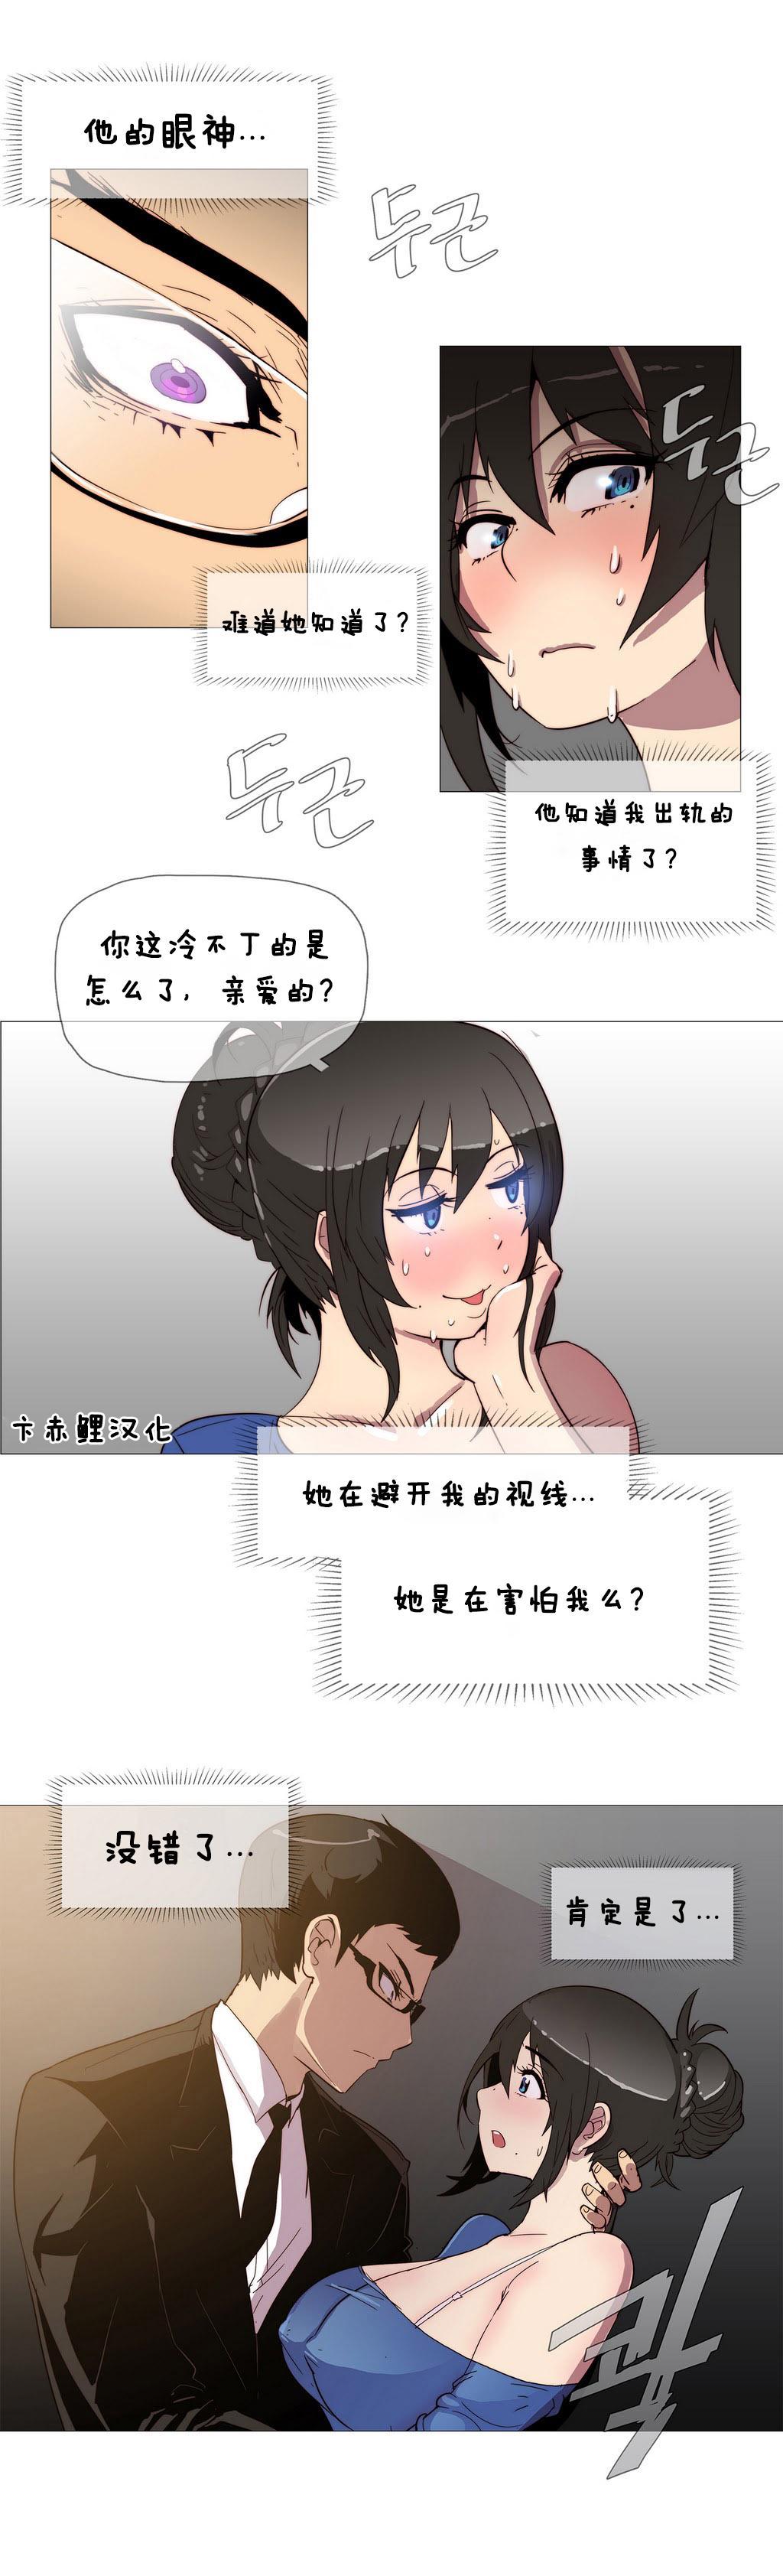 HouseHold Affairs 【卞赤鲤个人汉化】1~21话(持续更新中) 50